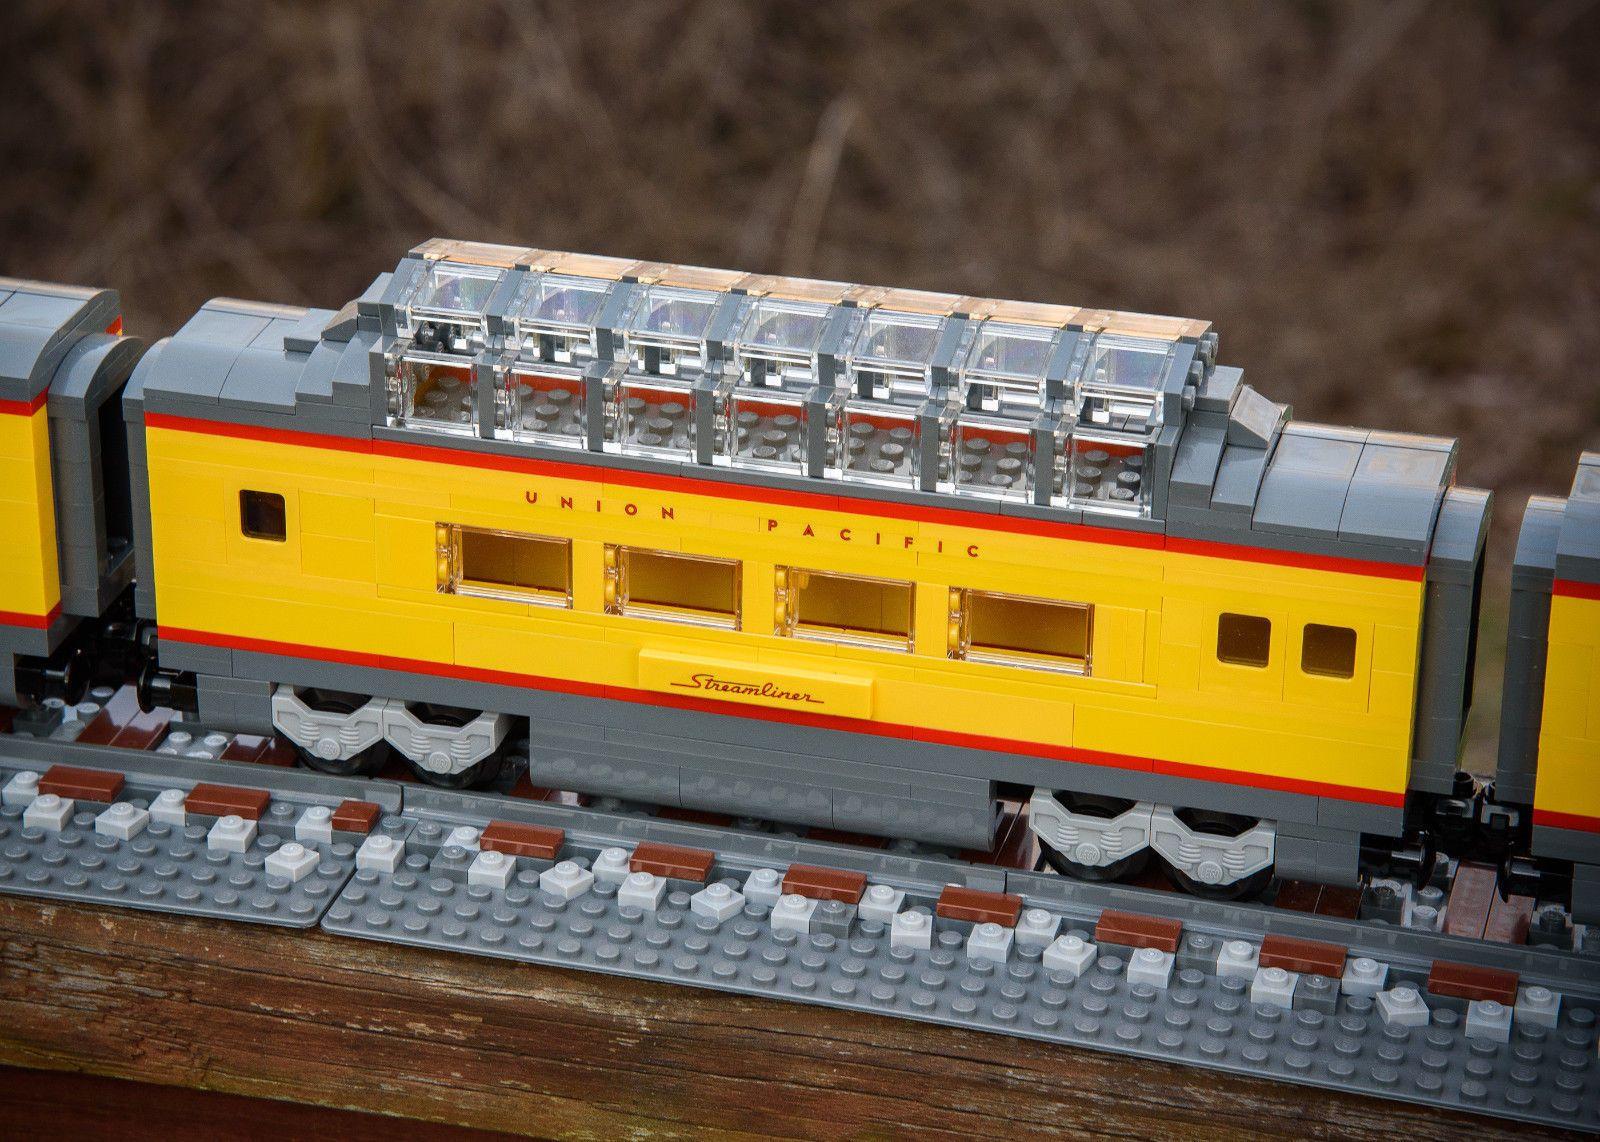 lego custom train union pacific locomotive b unit and passenger